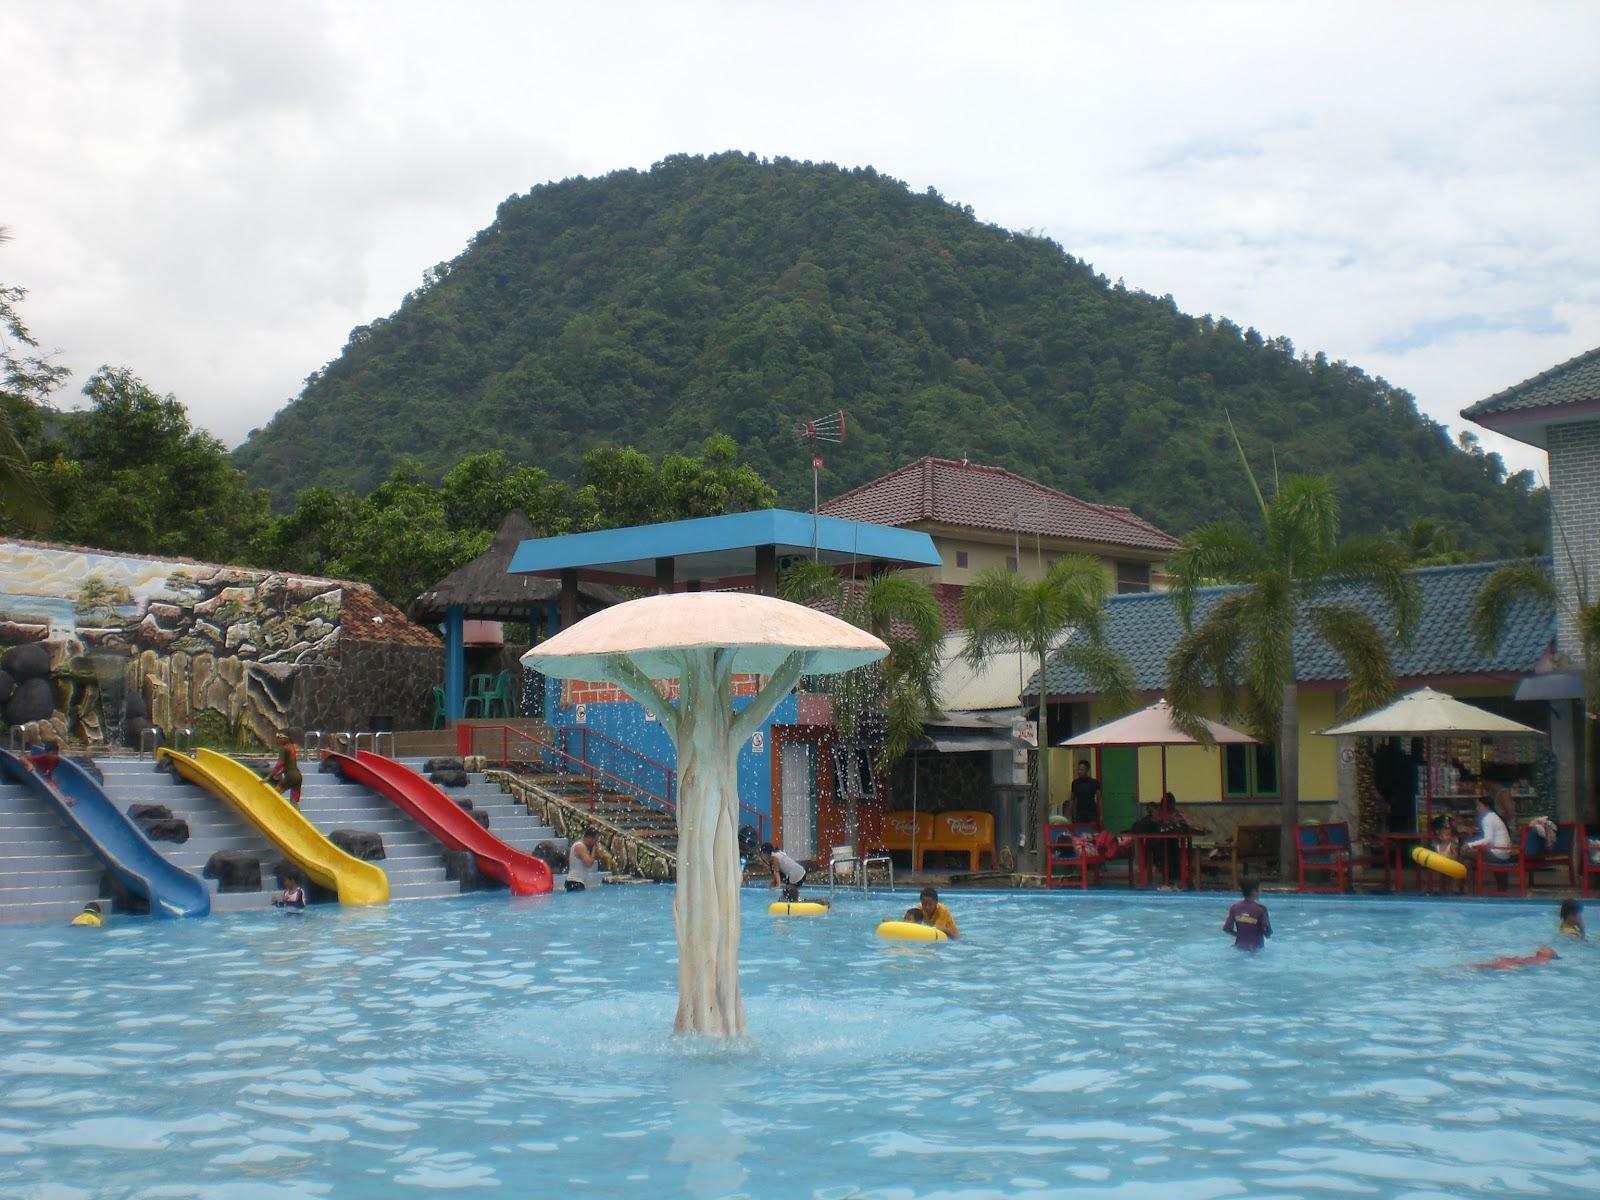 Area kolam renang Tirta Indah © Triptrus.id